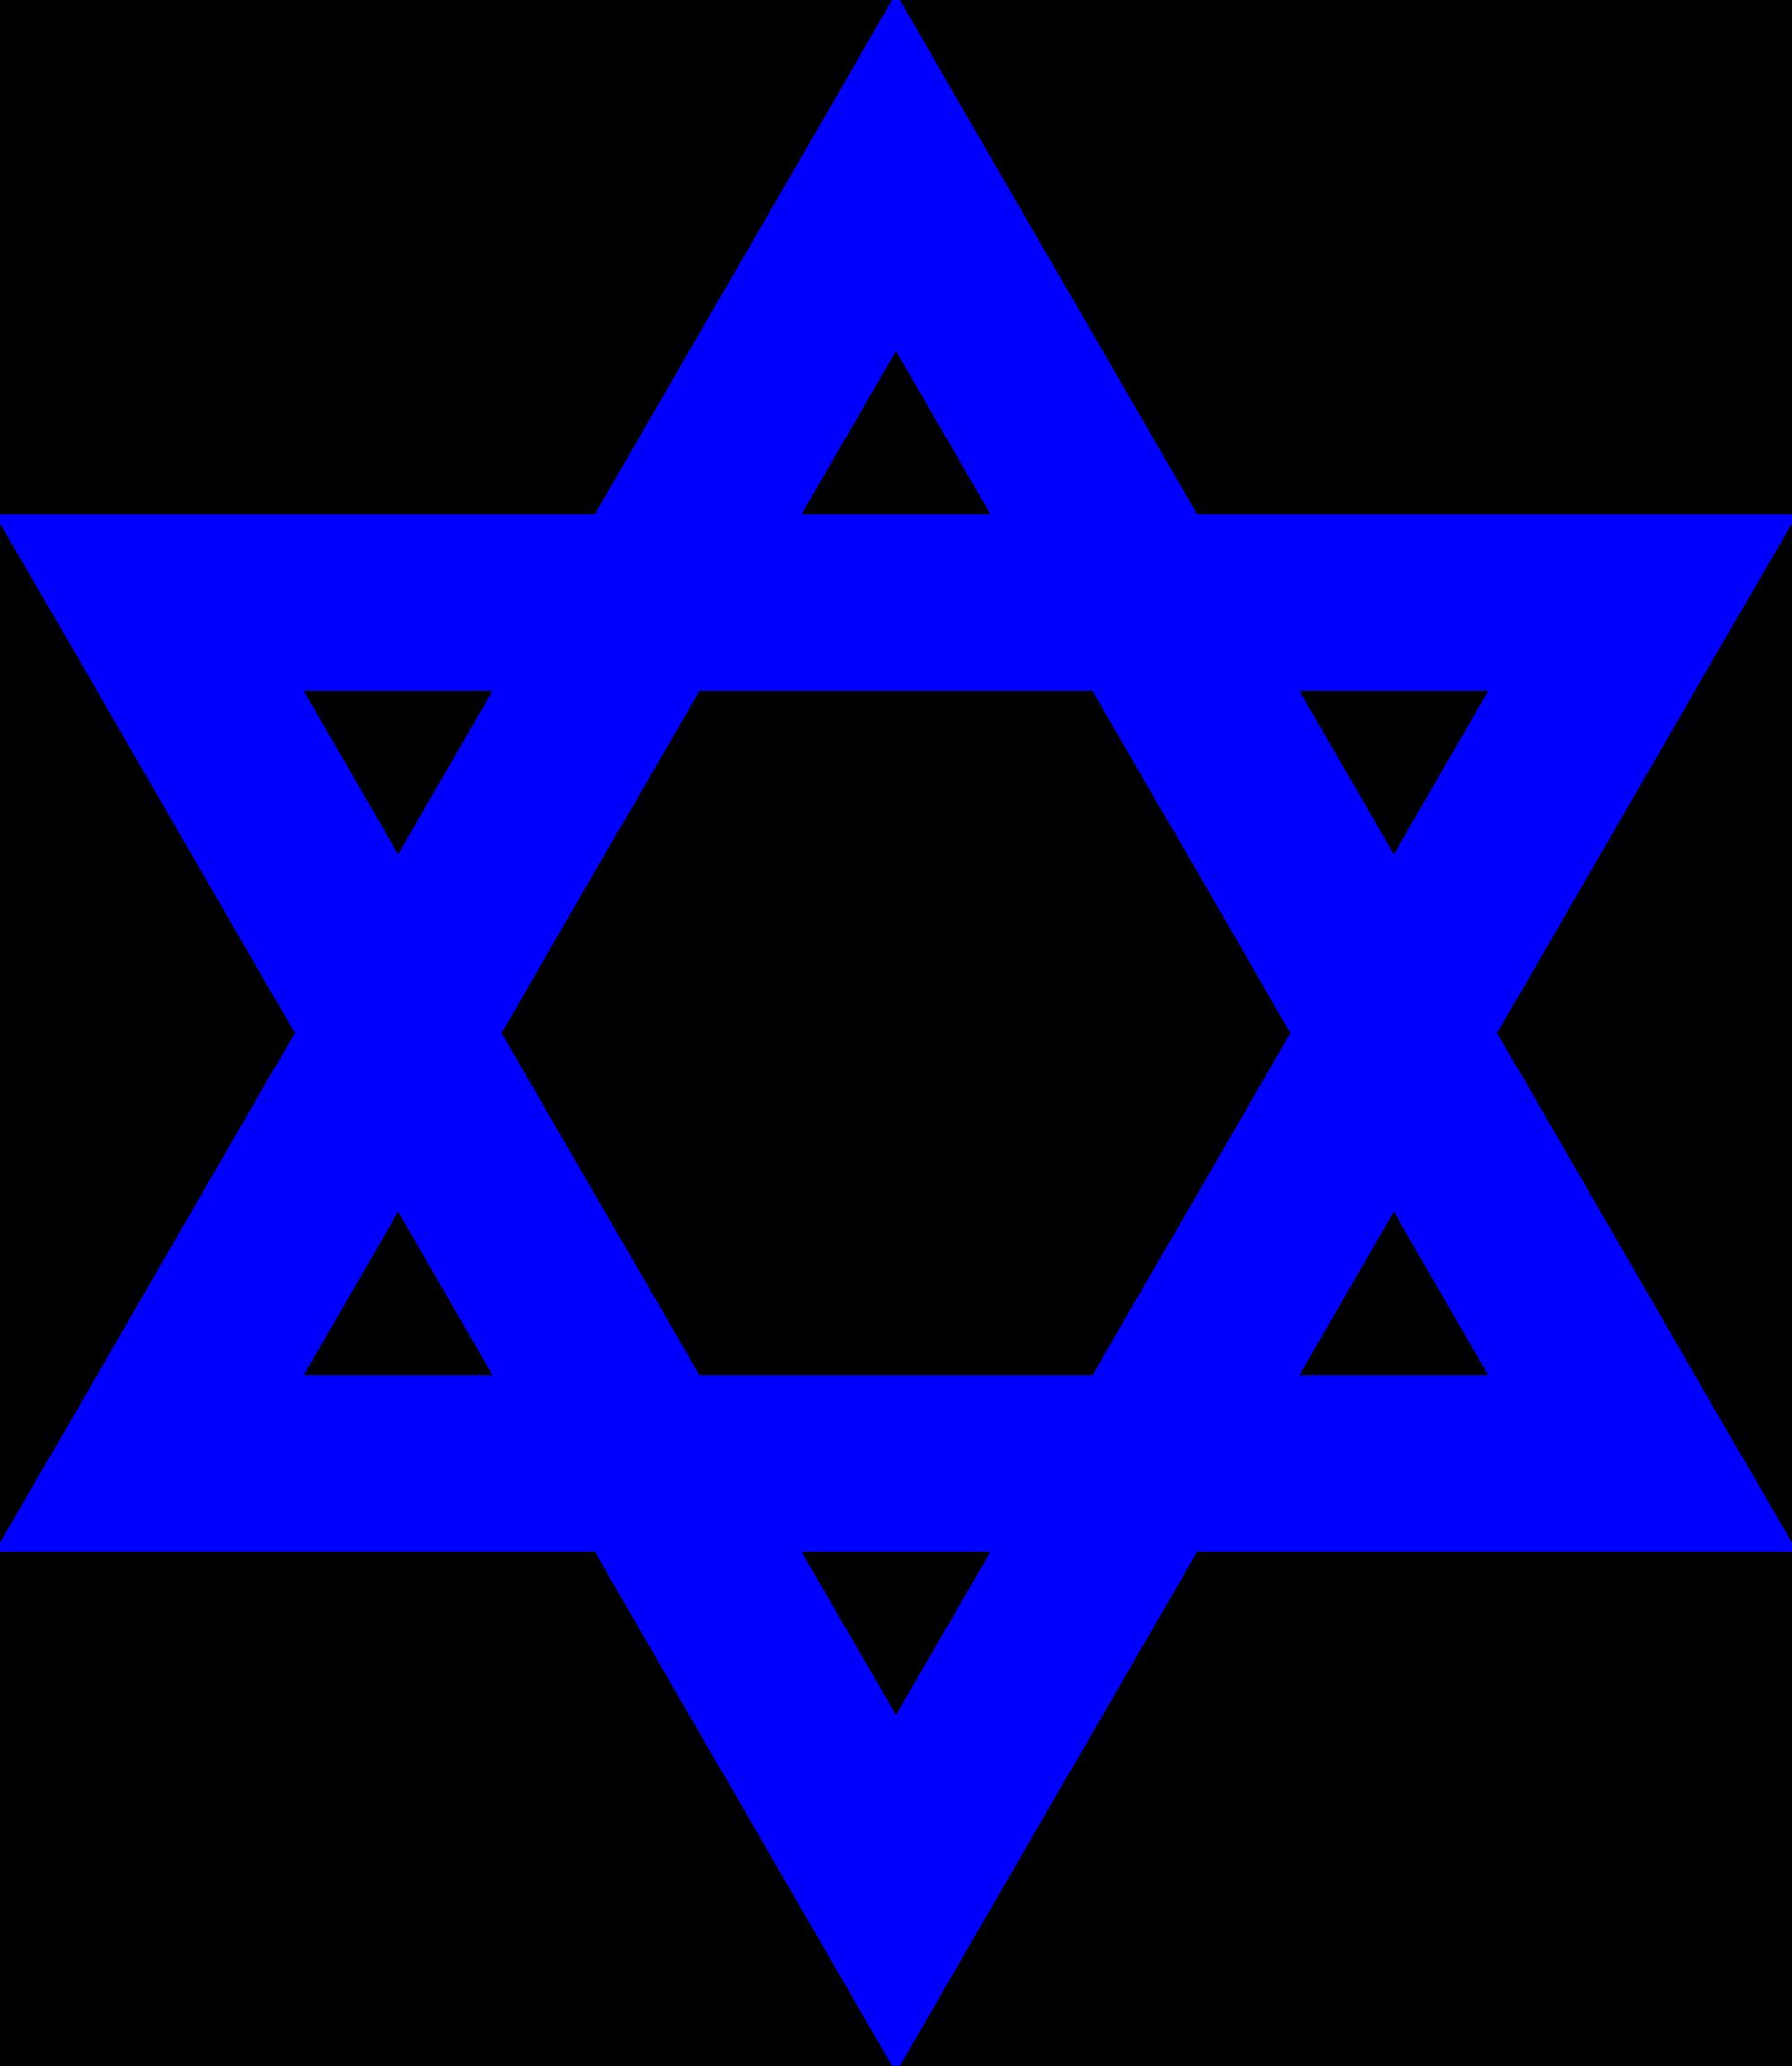 Ornithogalum umbellatum (Star of Bethlehem) - BBC